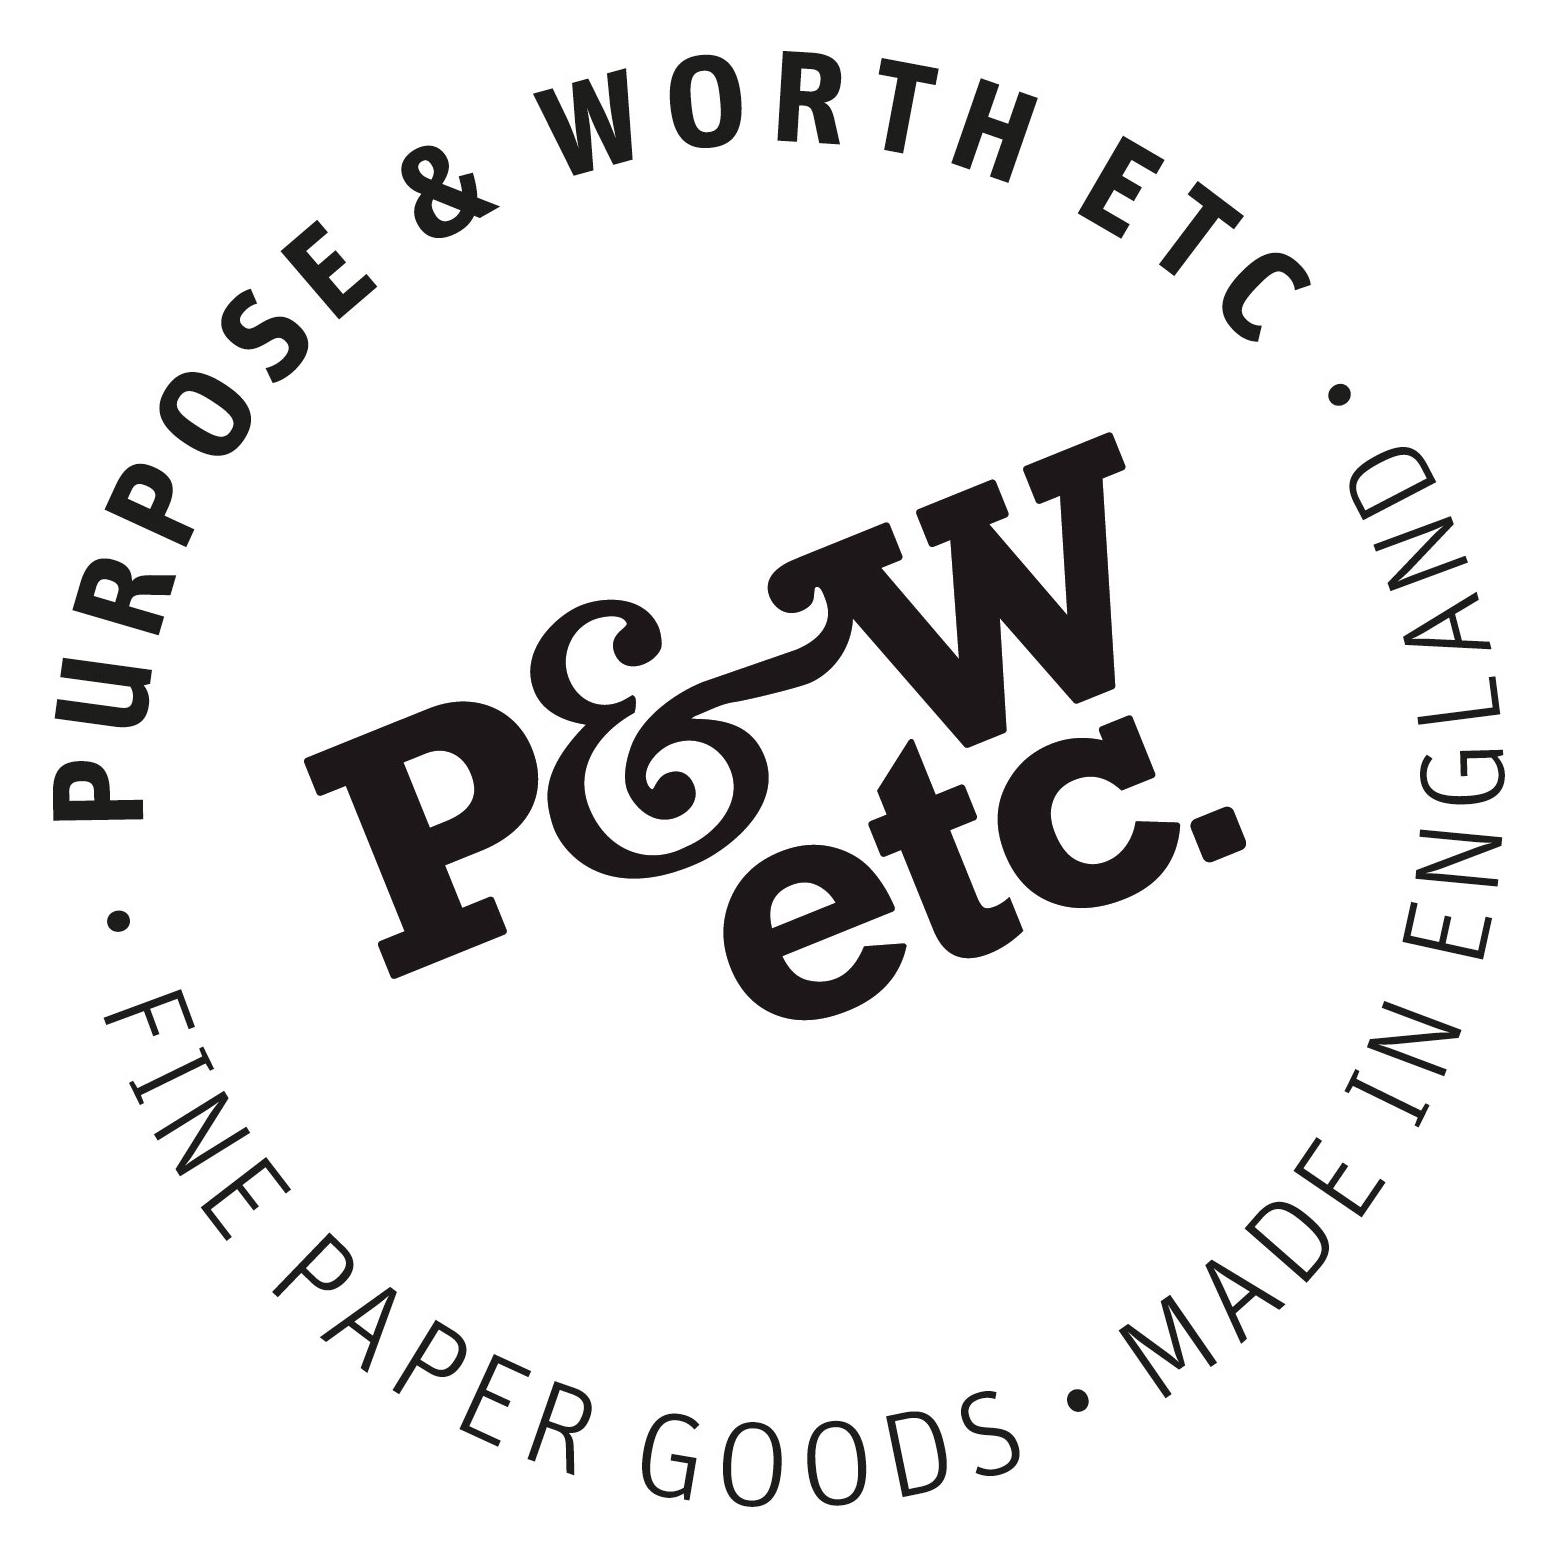 P&Wetc_logo_rotate_FPG_MIE_small.jpg